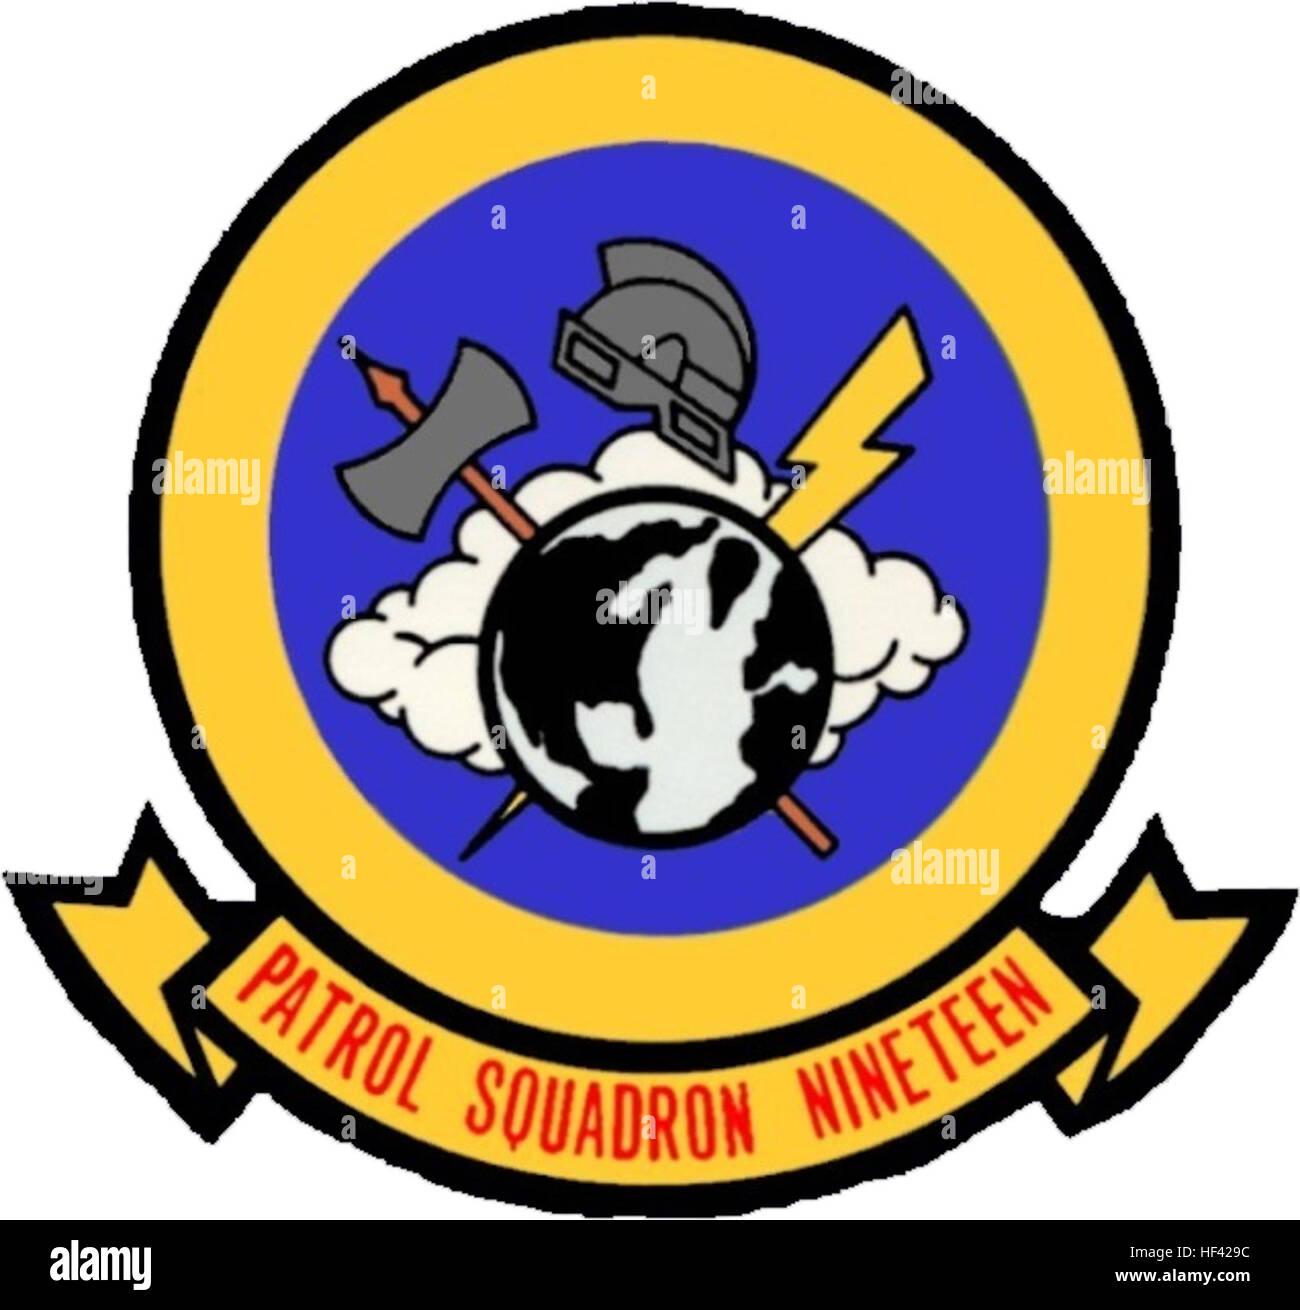 Patrol squadron 19 us navy insignia 1964 stock photo 129782056 patrol squadron 19 us navy insignia 1964 biocorpaavc